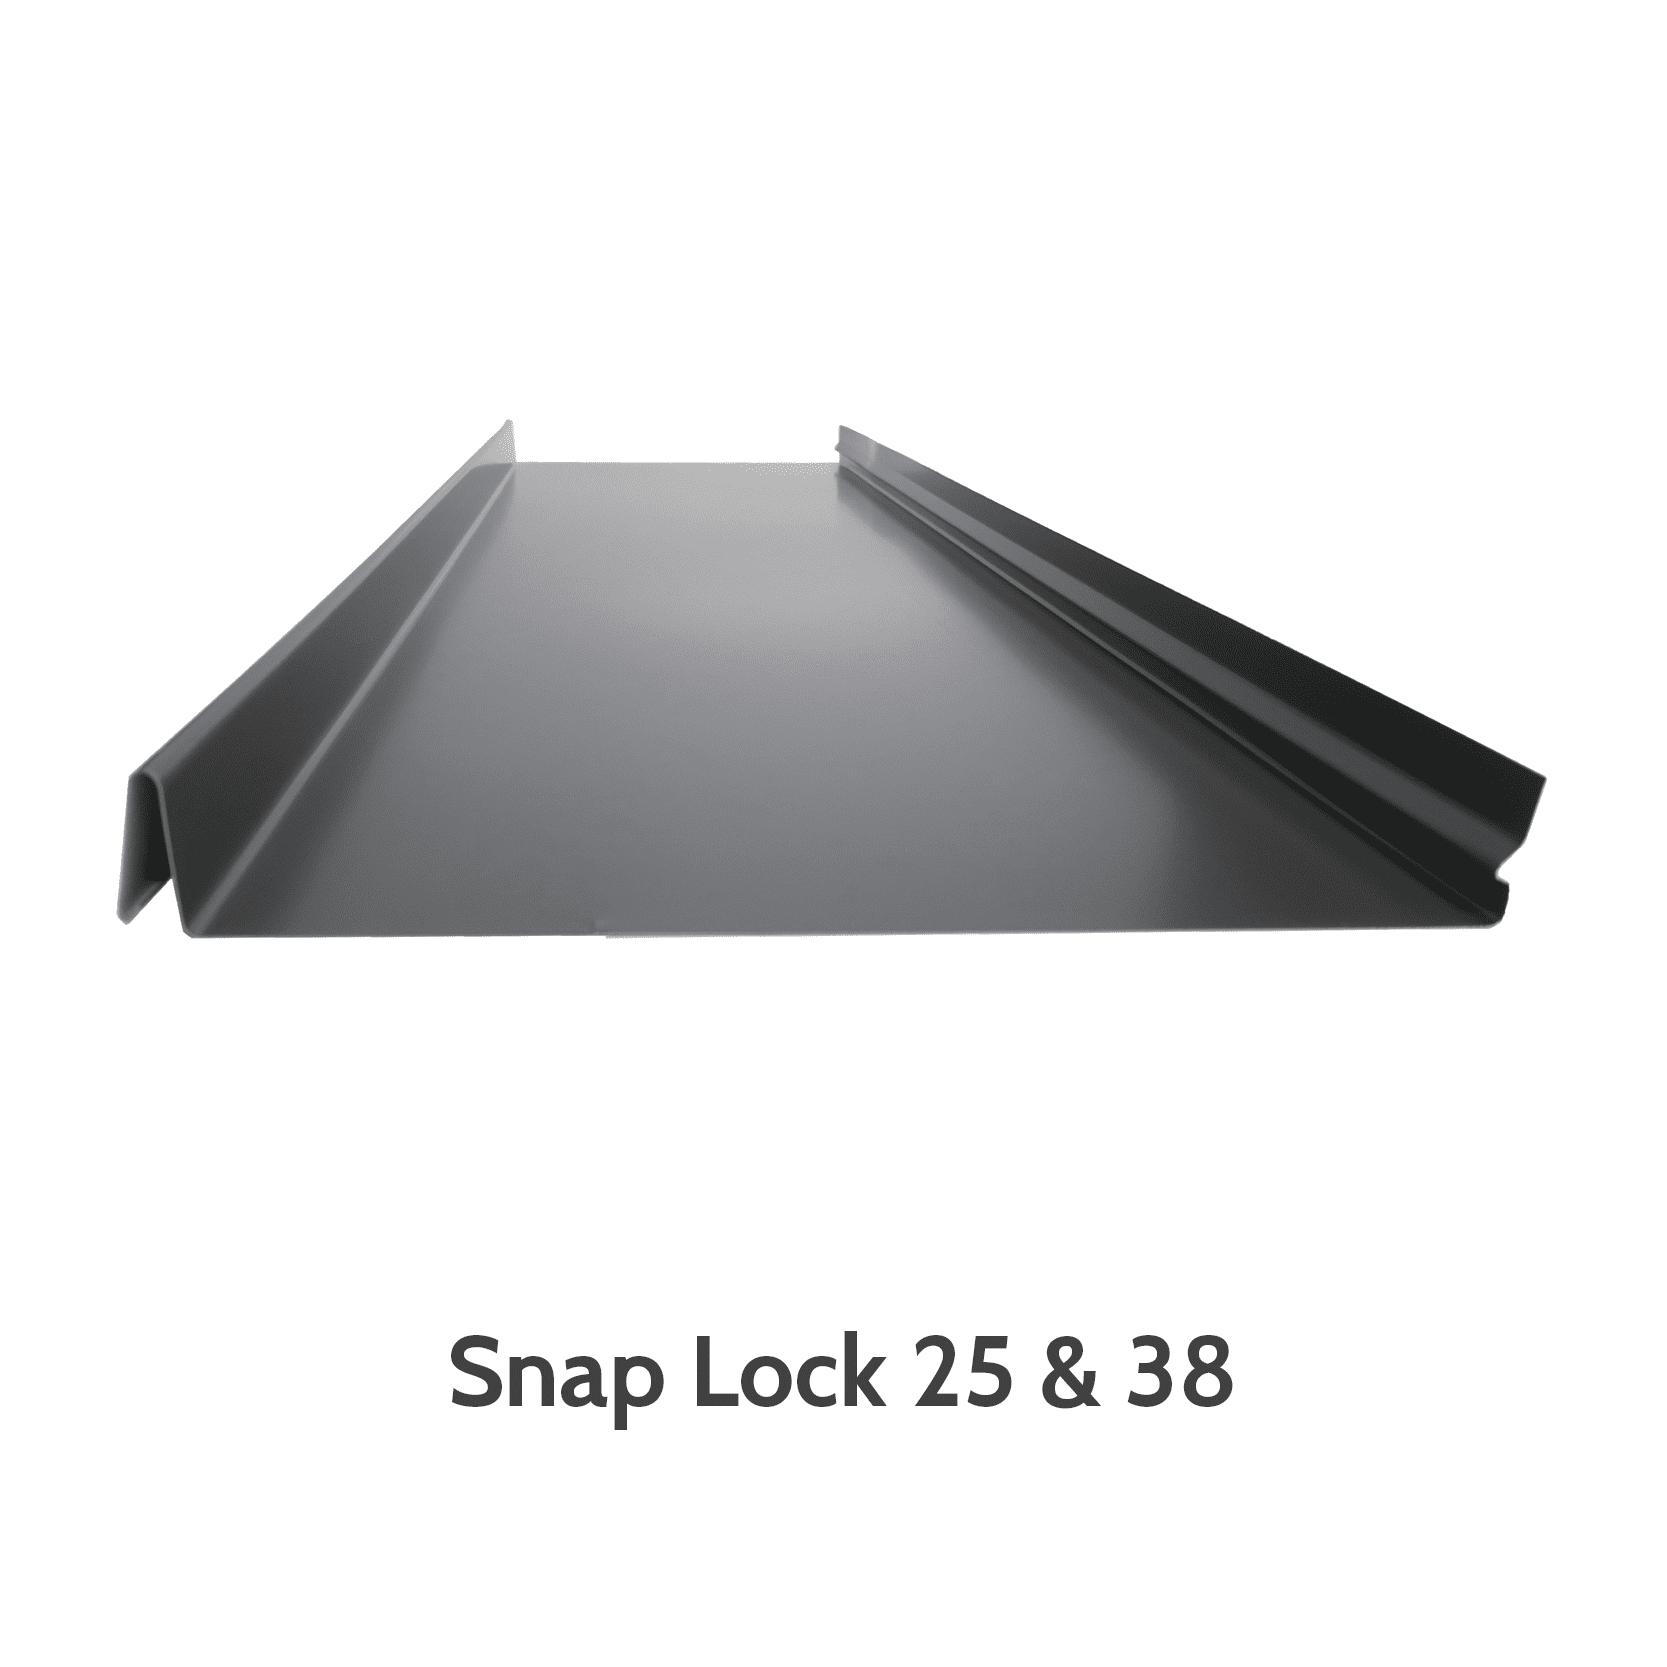 Snap Lock 25 & 38